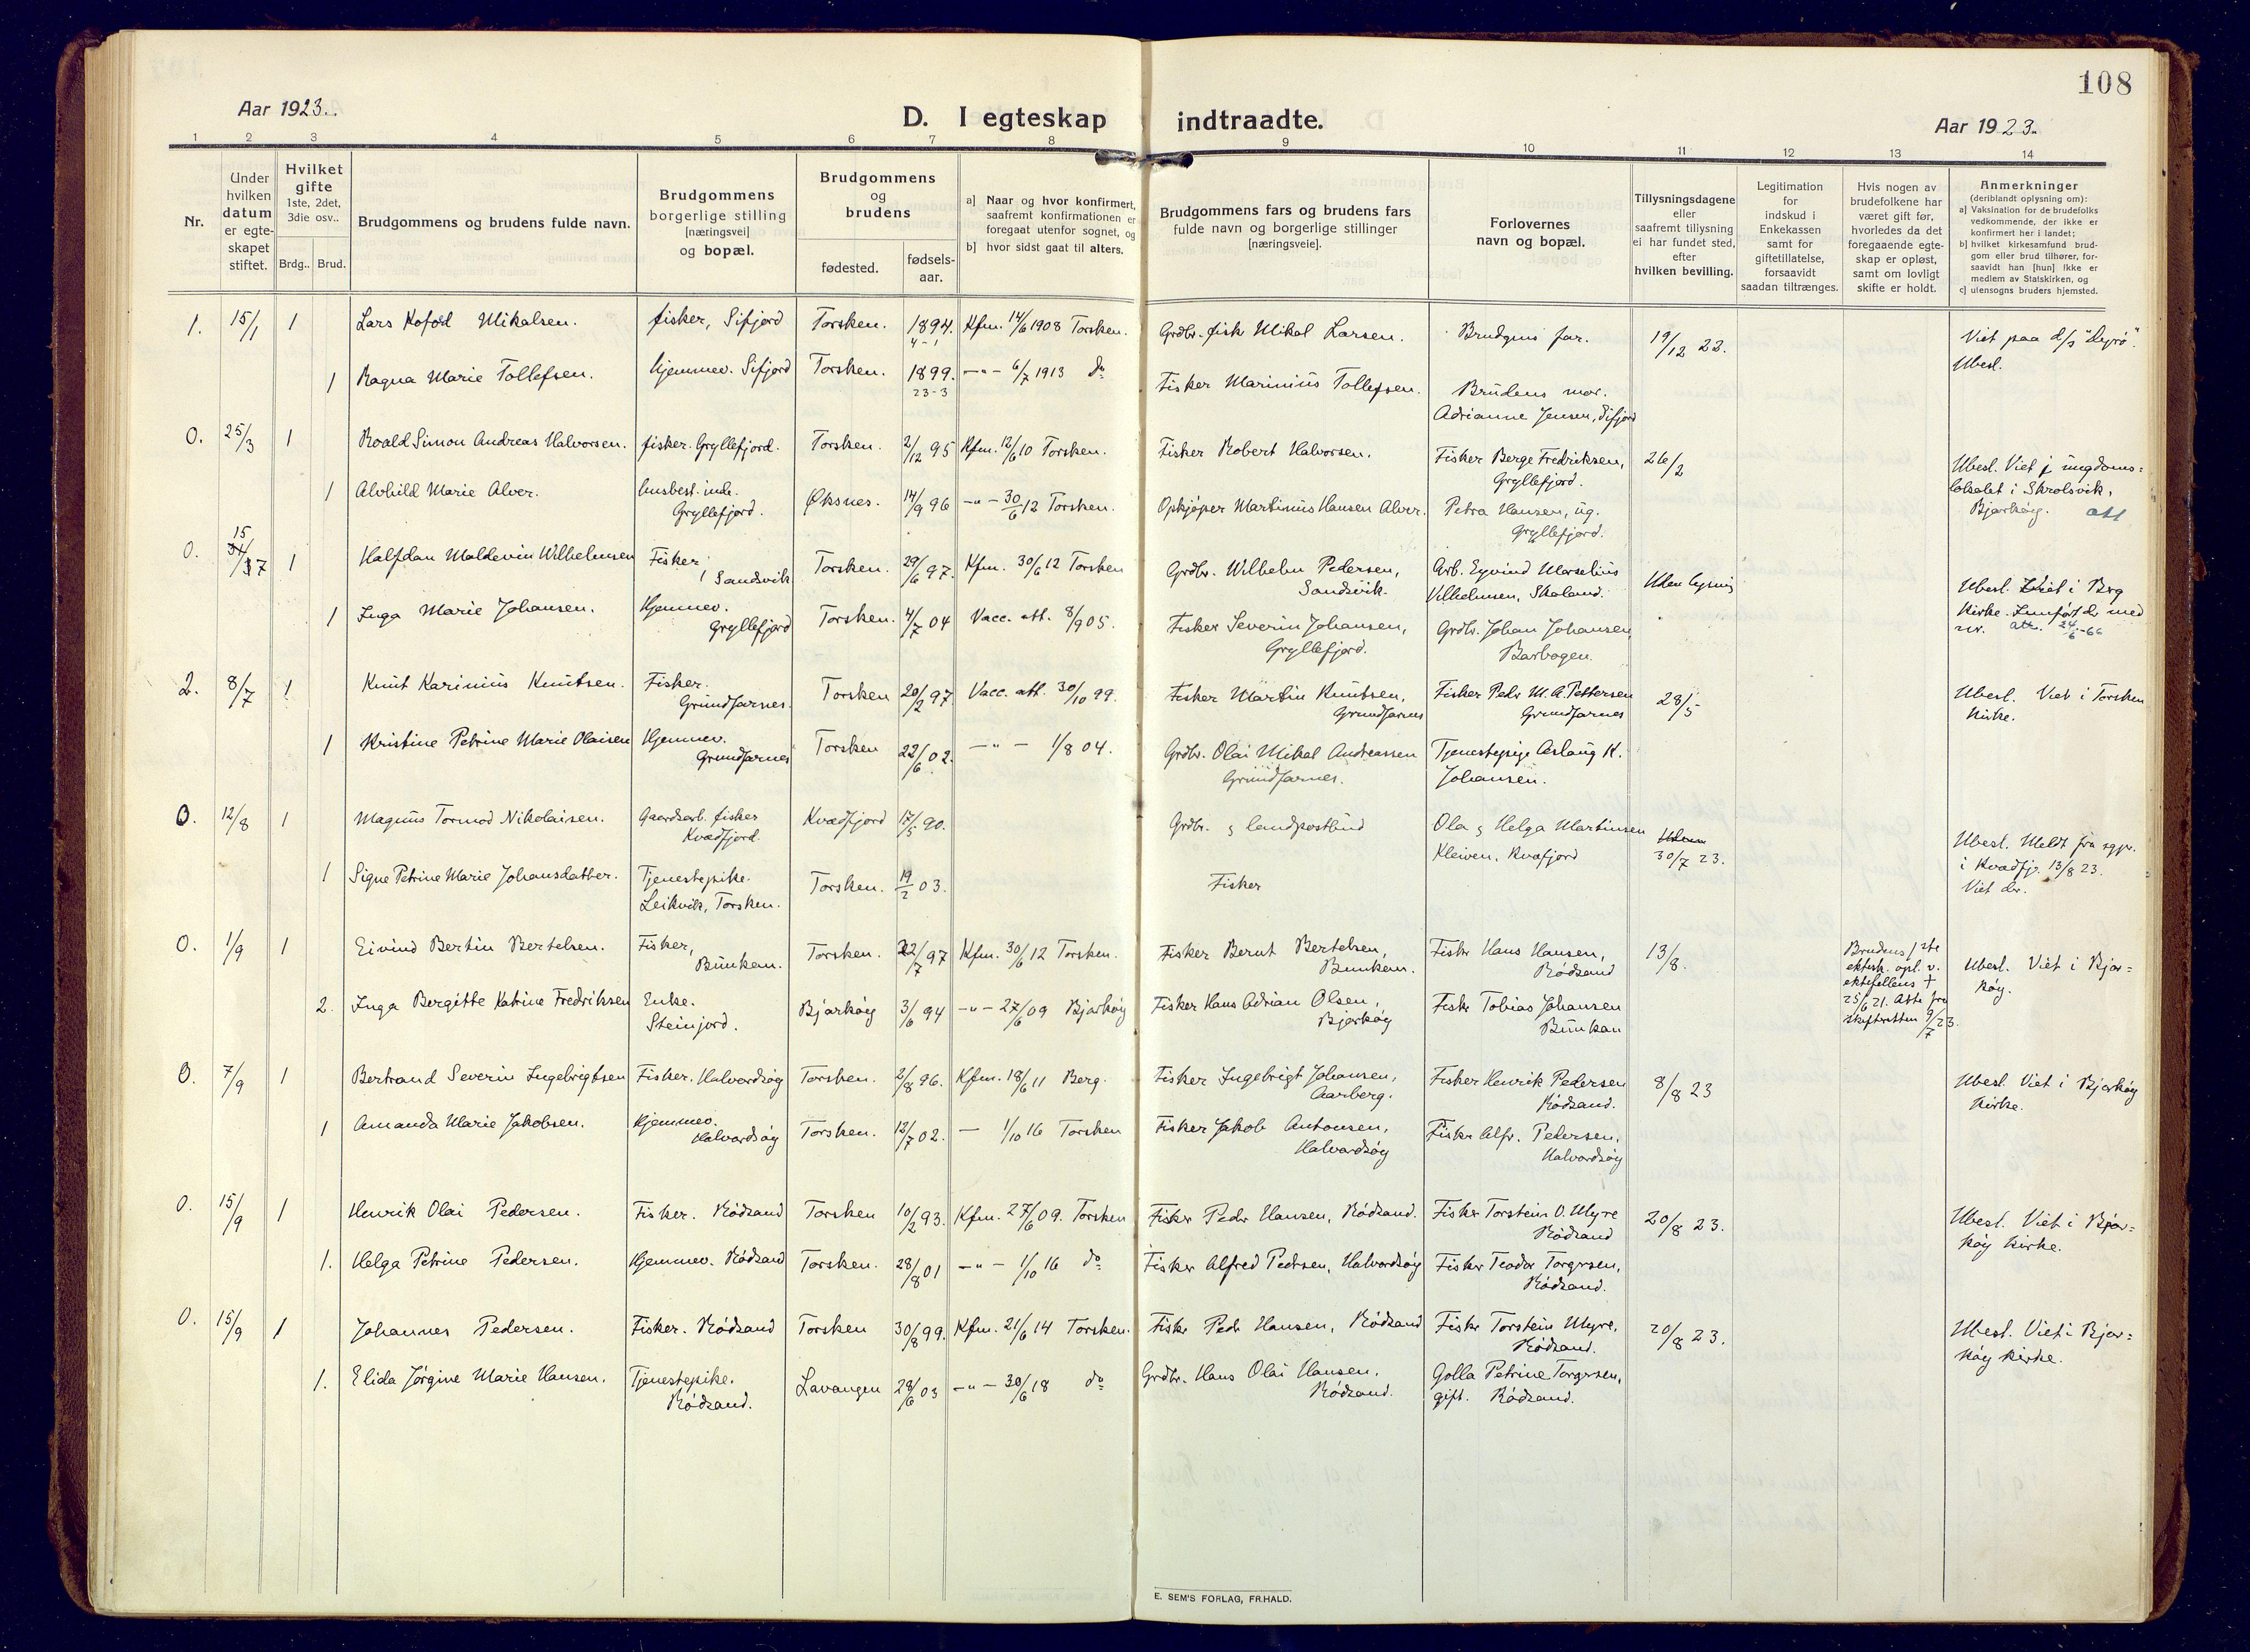 SATØ, Mefjord/Berg sokneprestkontor, G/Ga/Gaa: Ministerialbok nr. 10, 1916-1928, s. 108